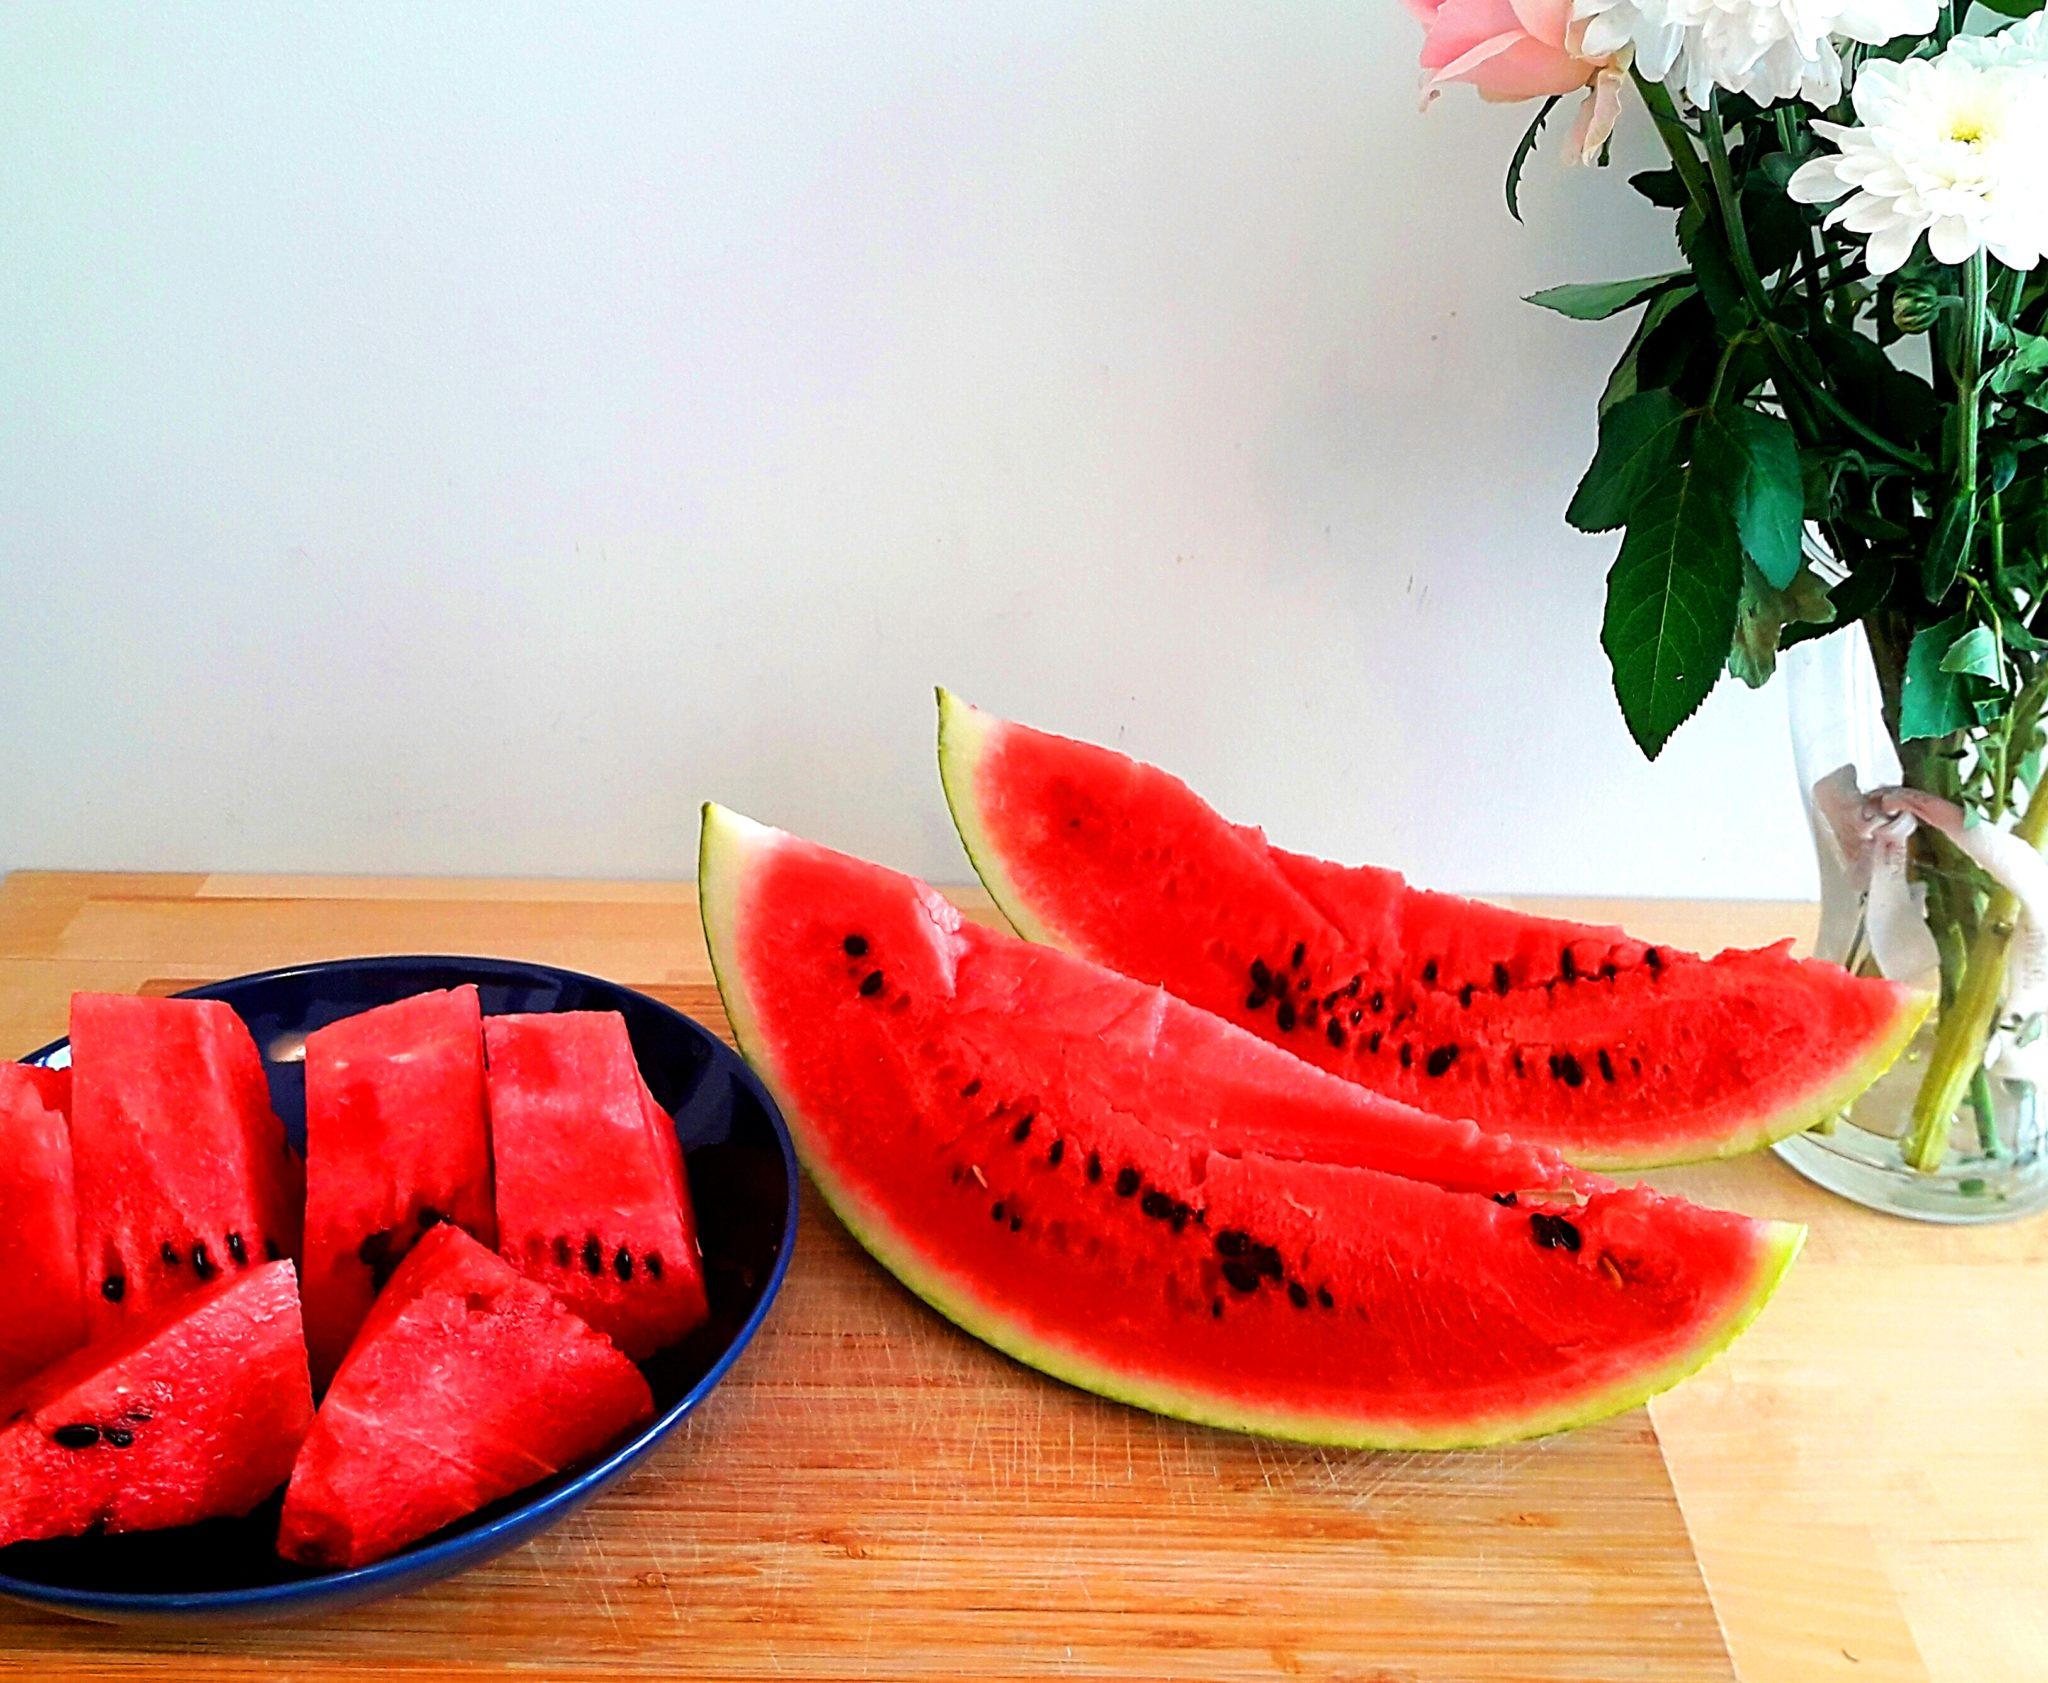 Kαρπούζι, το απόλυτο καλοκαιρινό φρούτο!